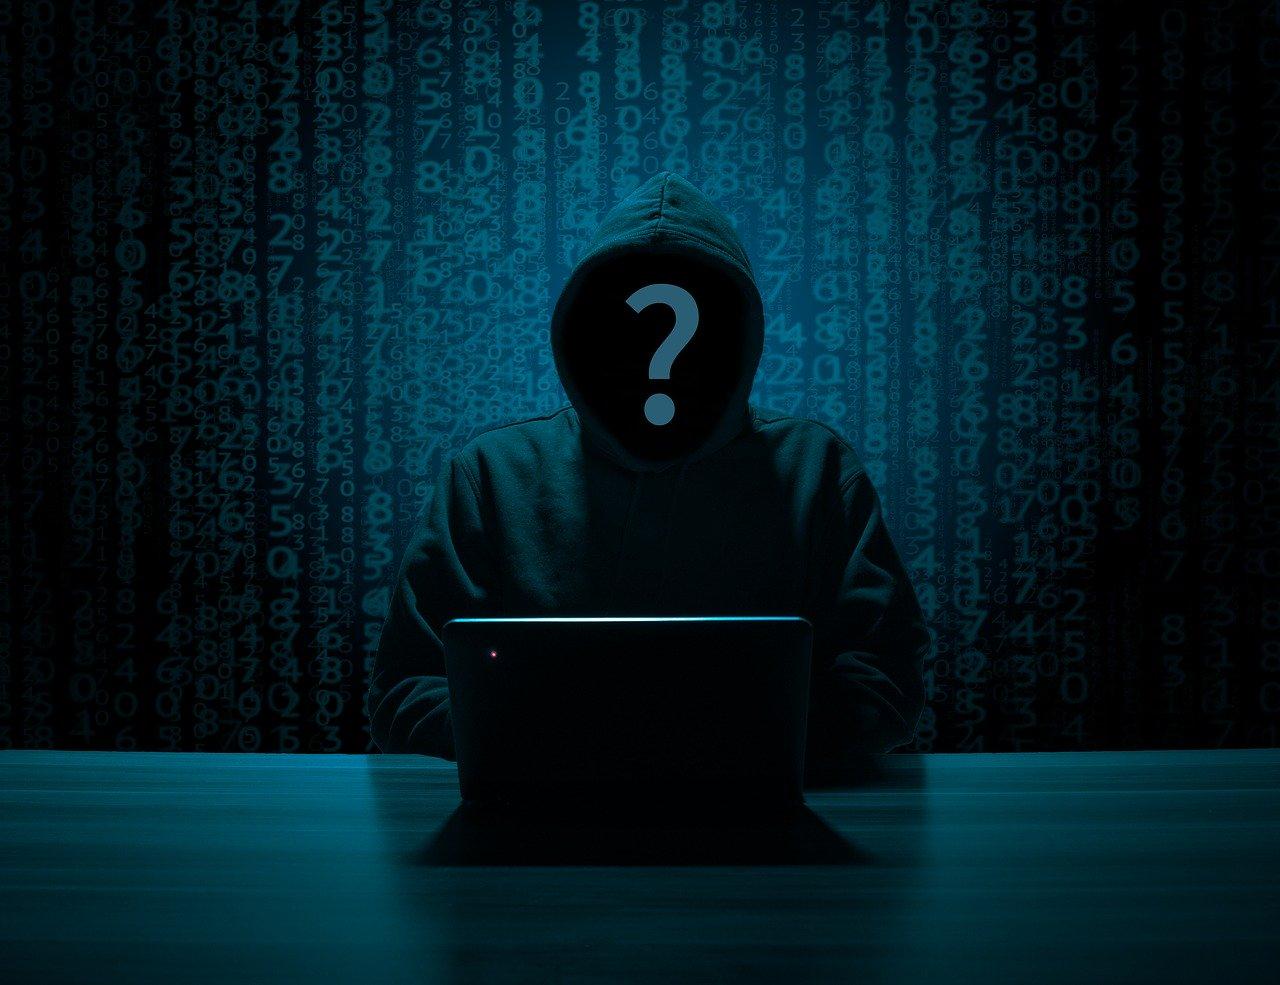 Phishing Email Scam - Virgin Media Urgent Billing Update